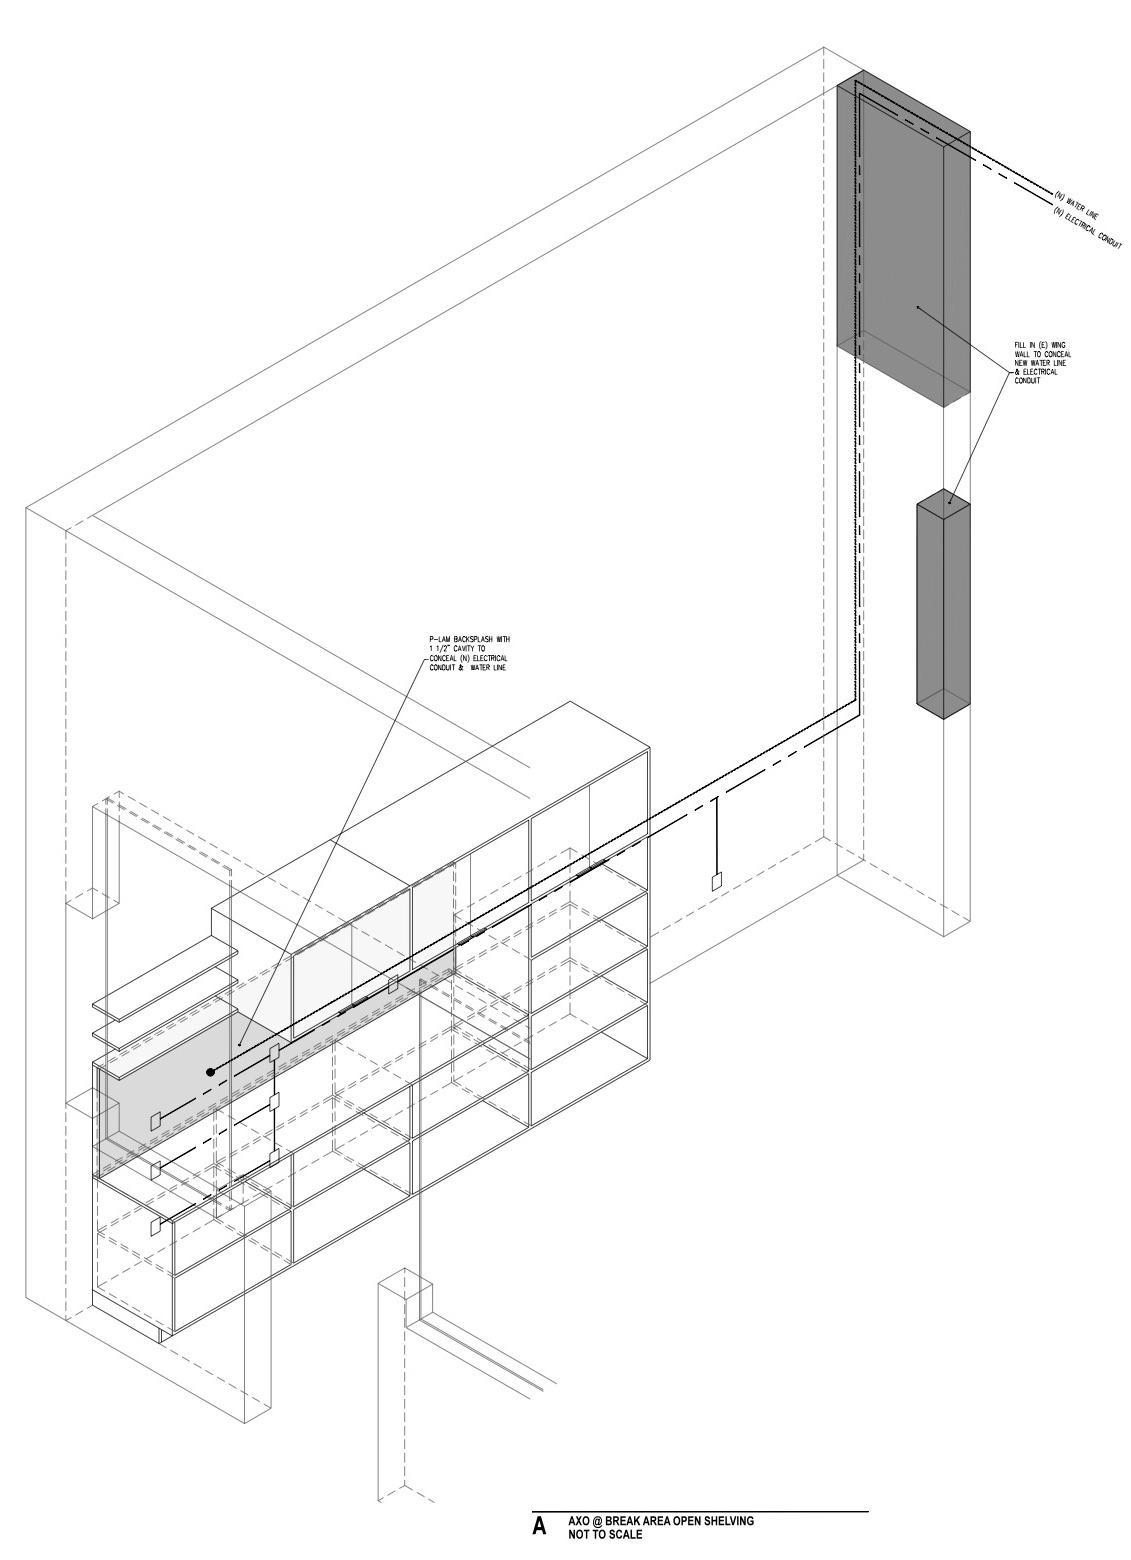 cabinetry_axo.jpg